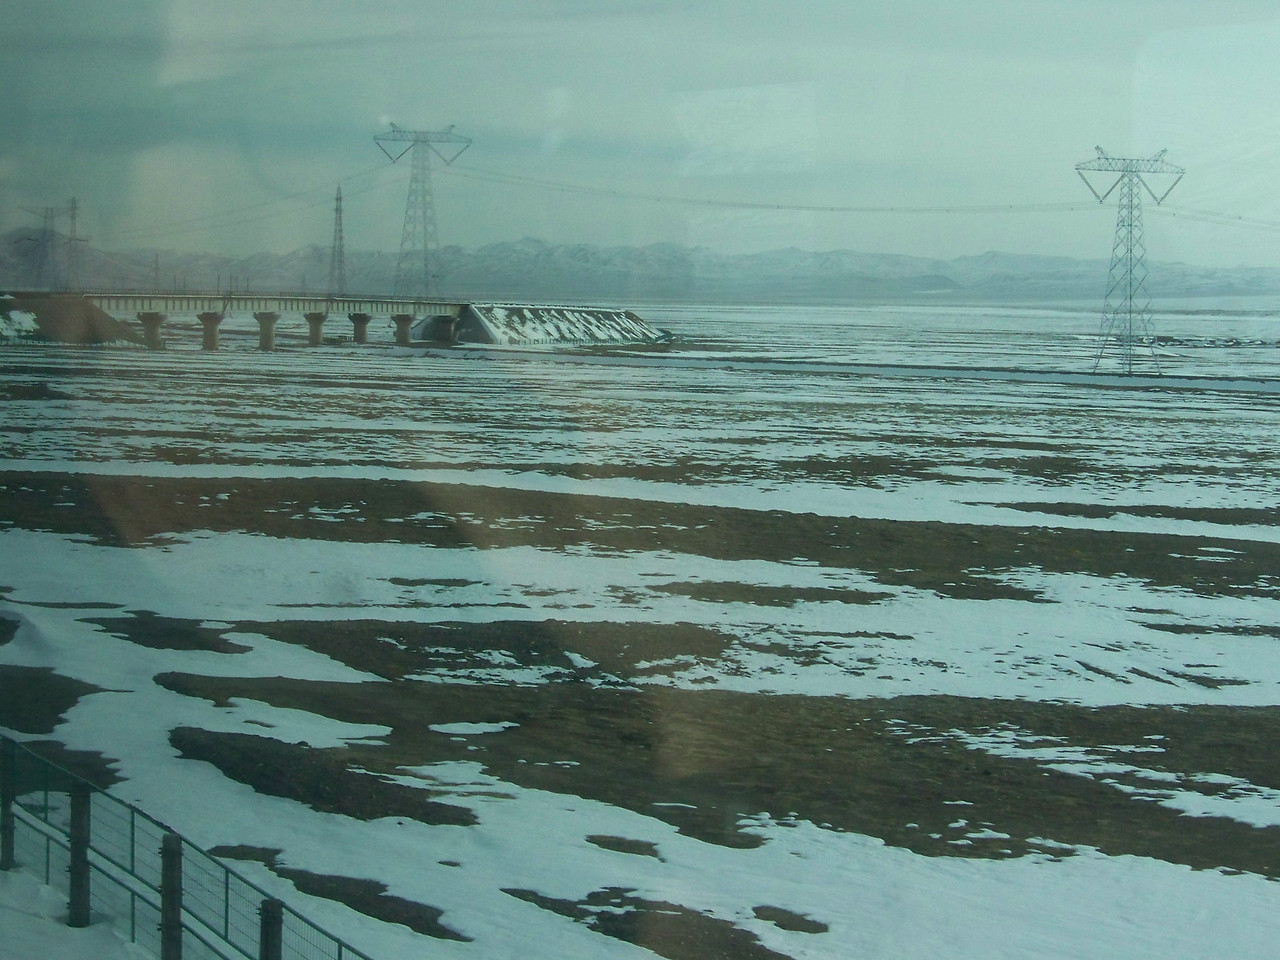 0099 - Scenery on Train Trip Between Beijing and Lhasa.JPG